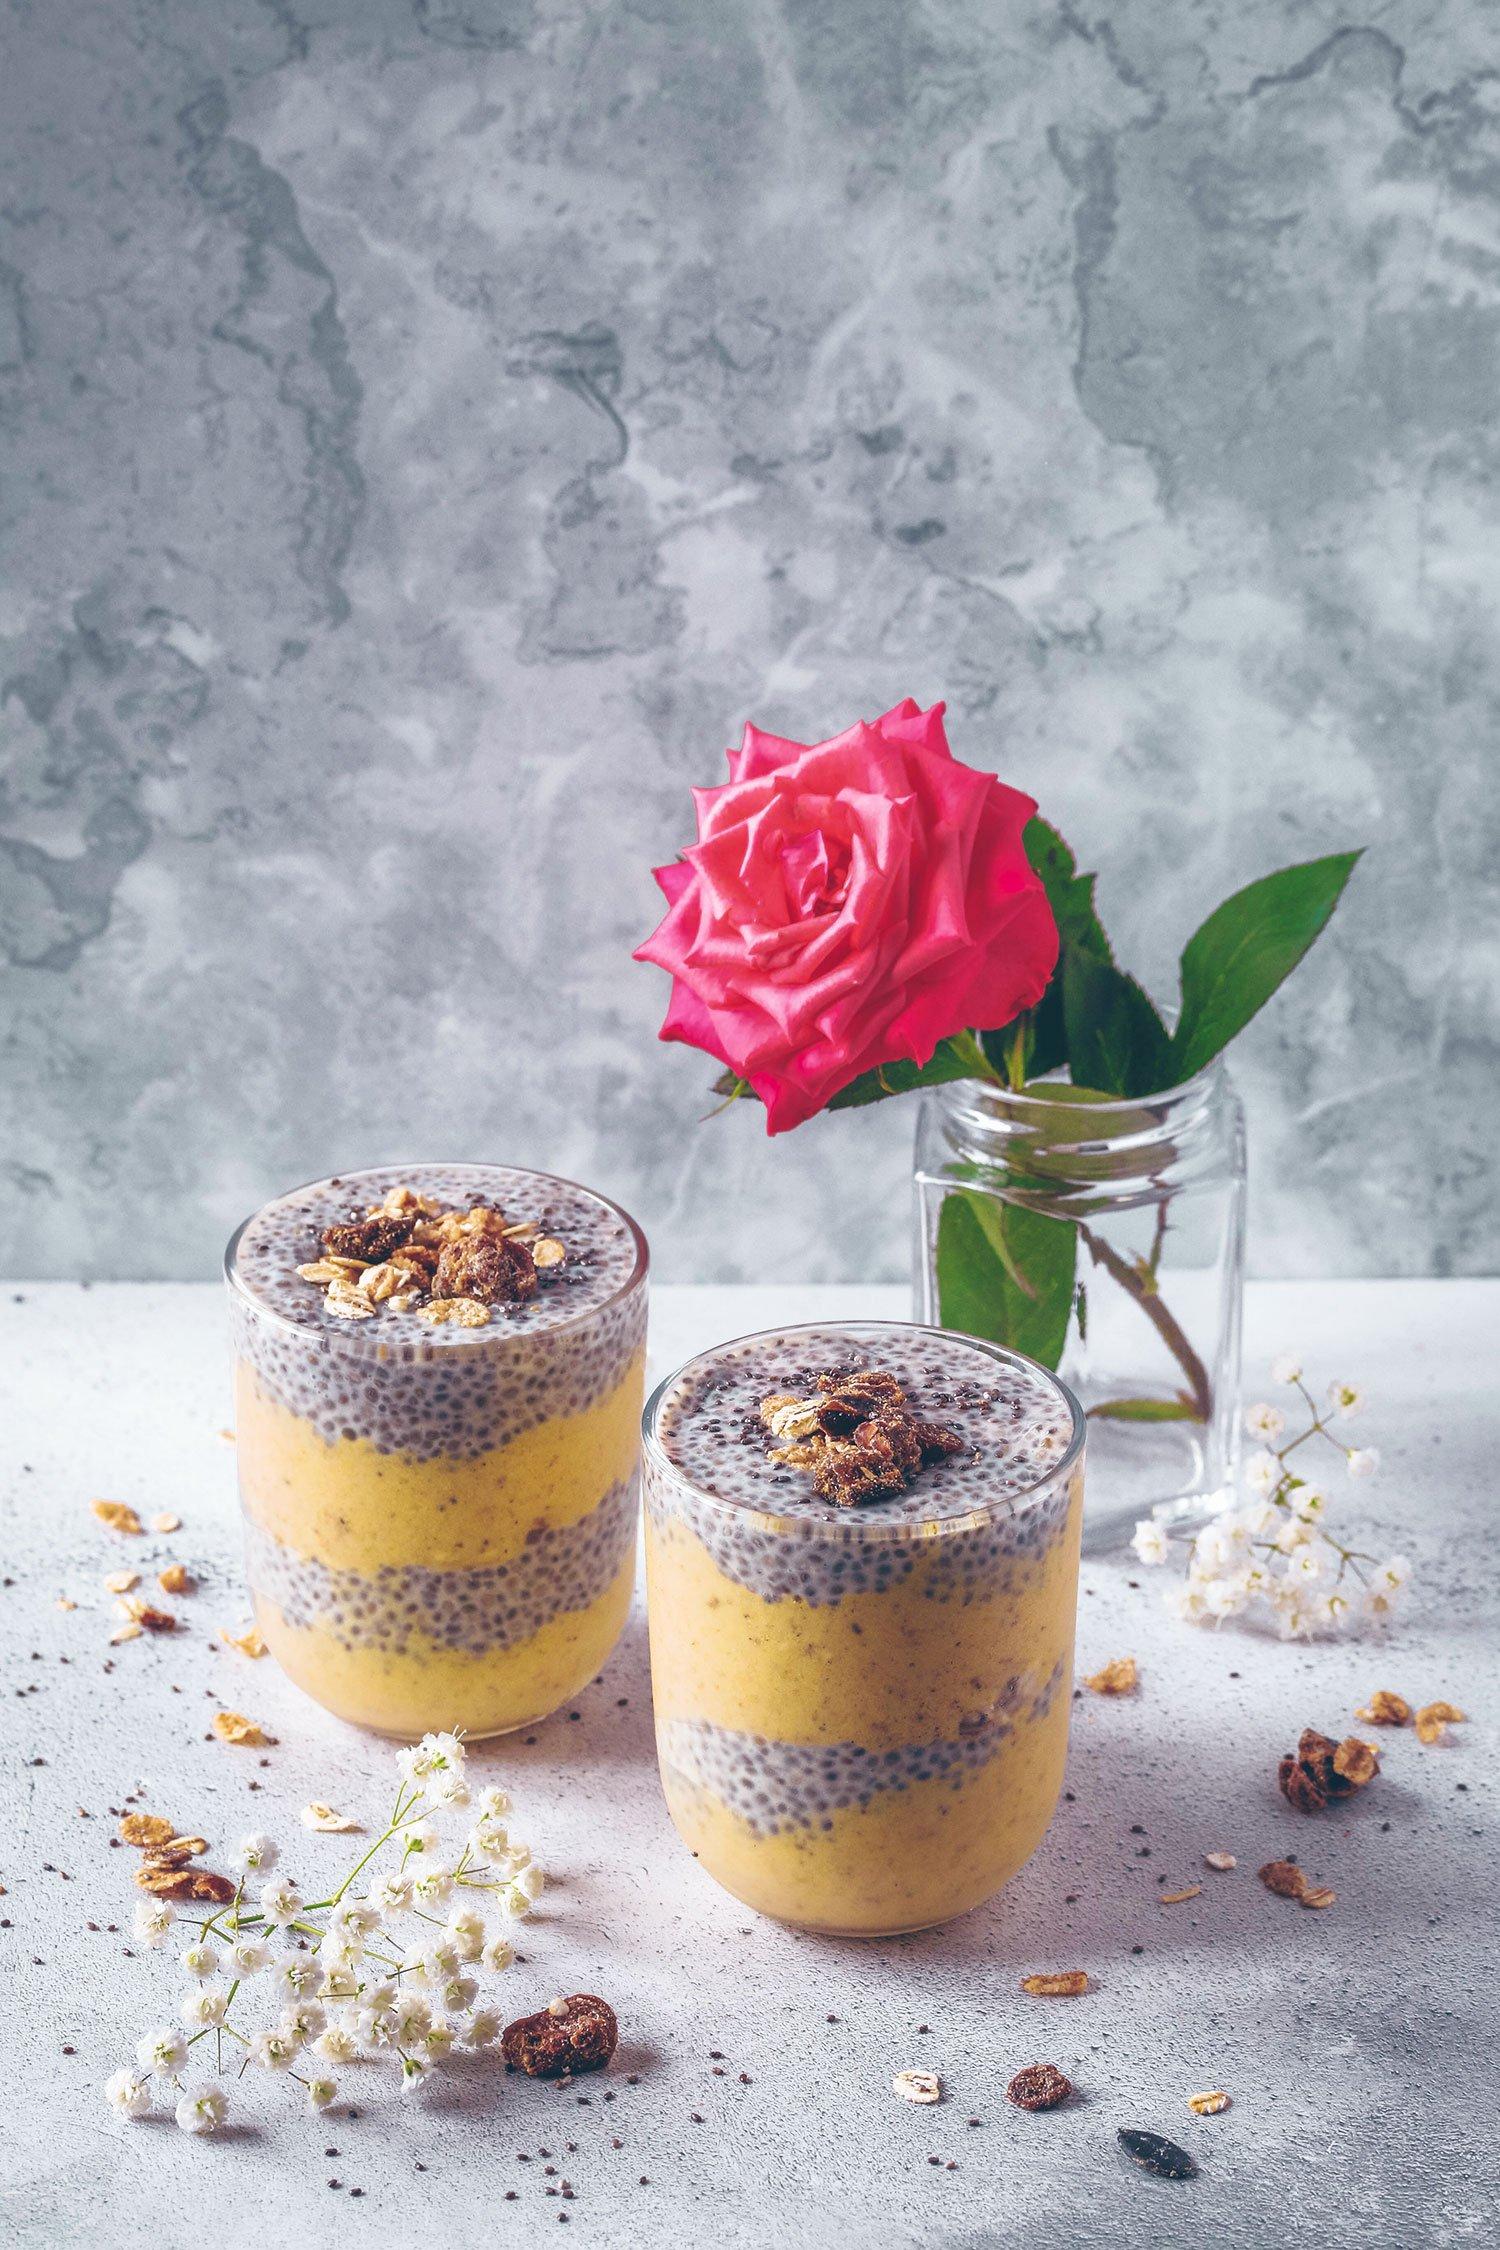 Golden Smoothie & Chia Pudding Parfait